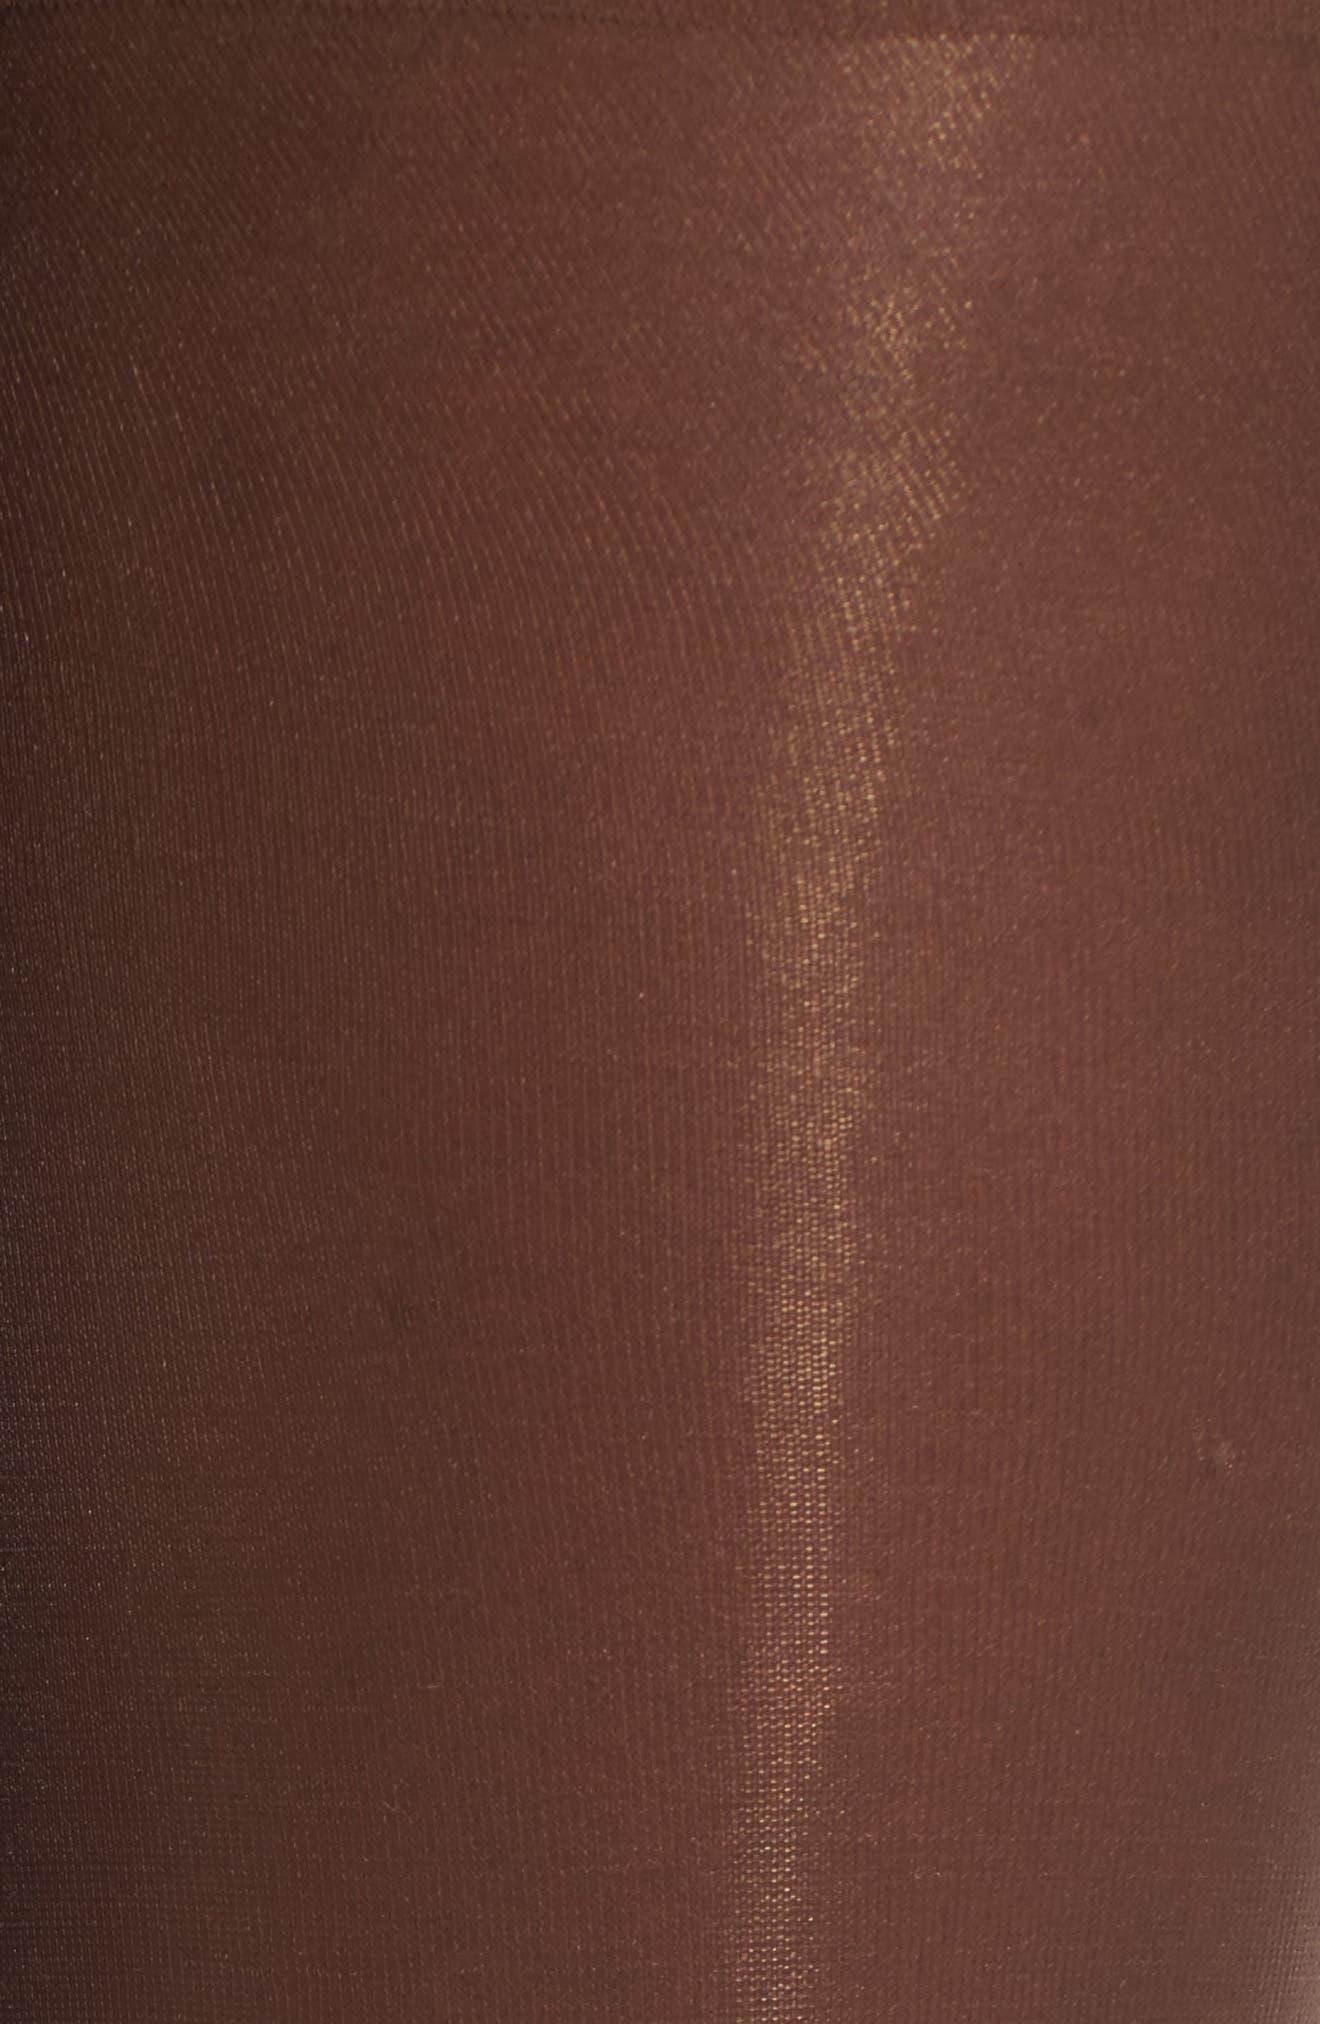 Glossy Sheer Pantyhose,                             Alternate thumbnail 2, color,                             200